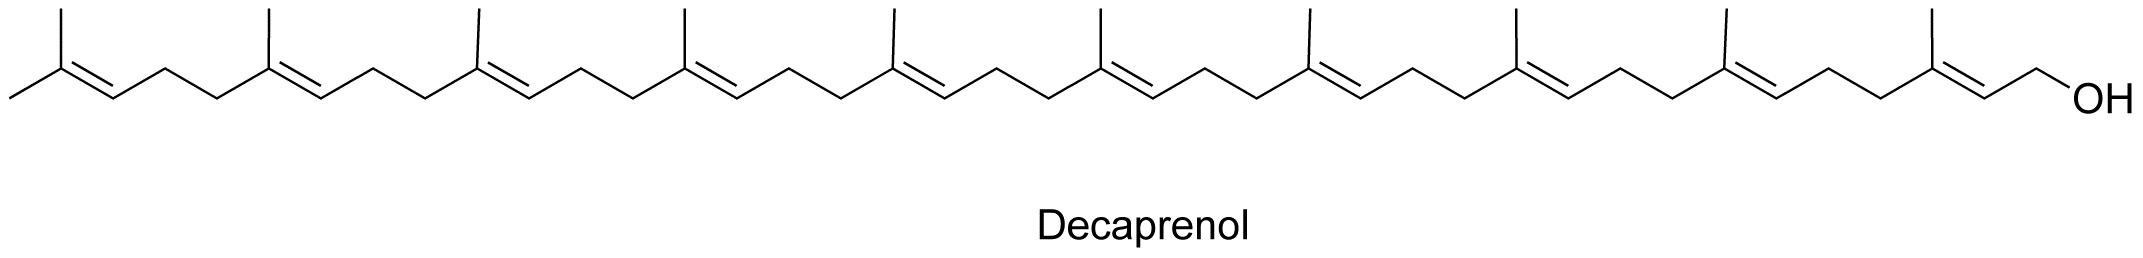 Decaprenol